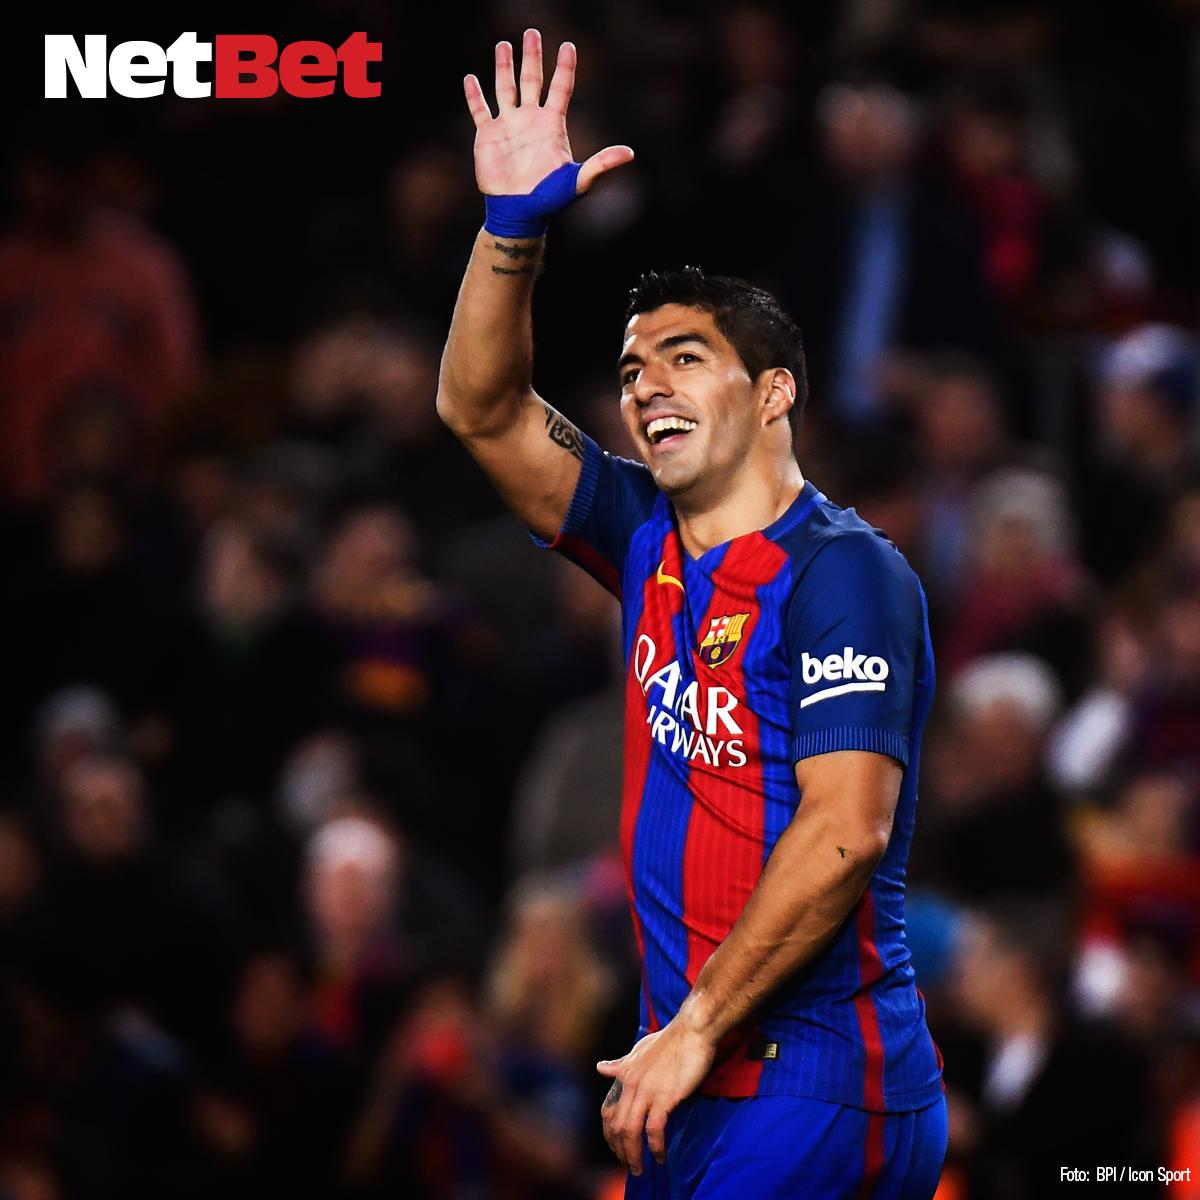 08-03-2017 - Barcelona - Luis Suarez